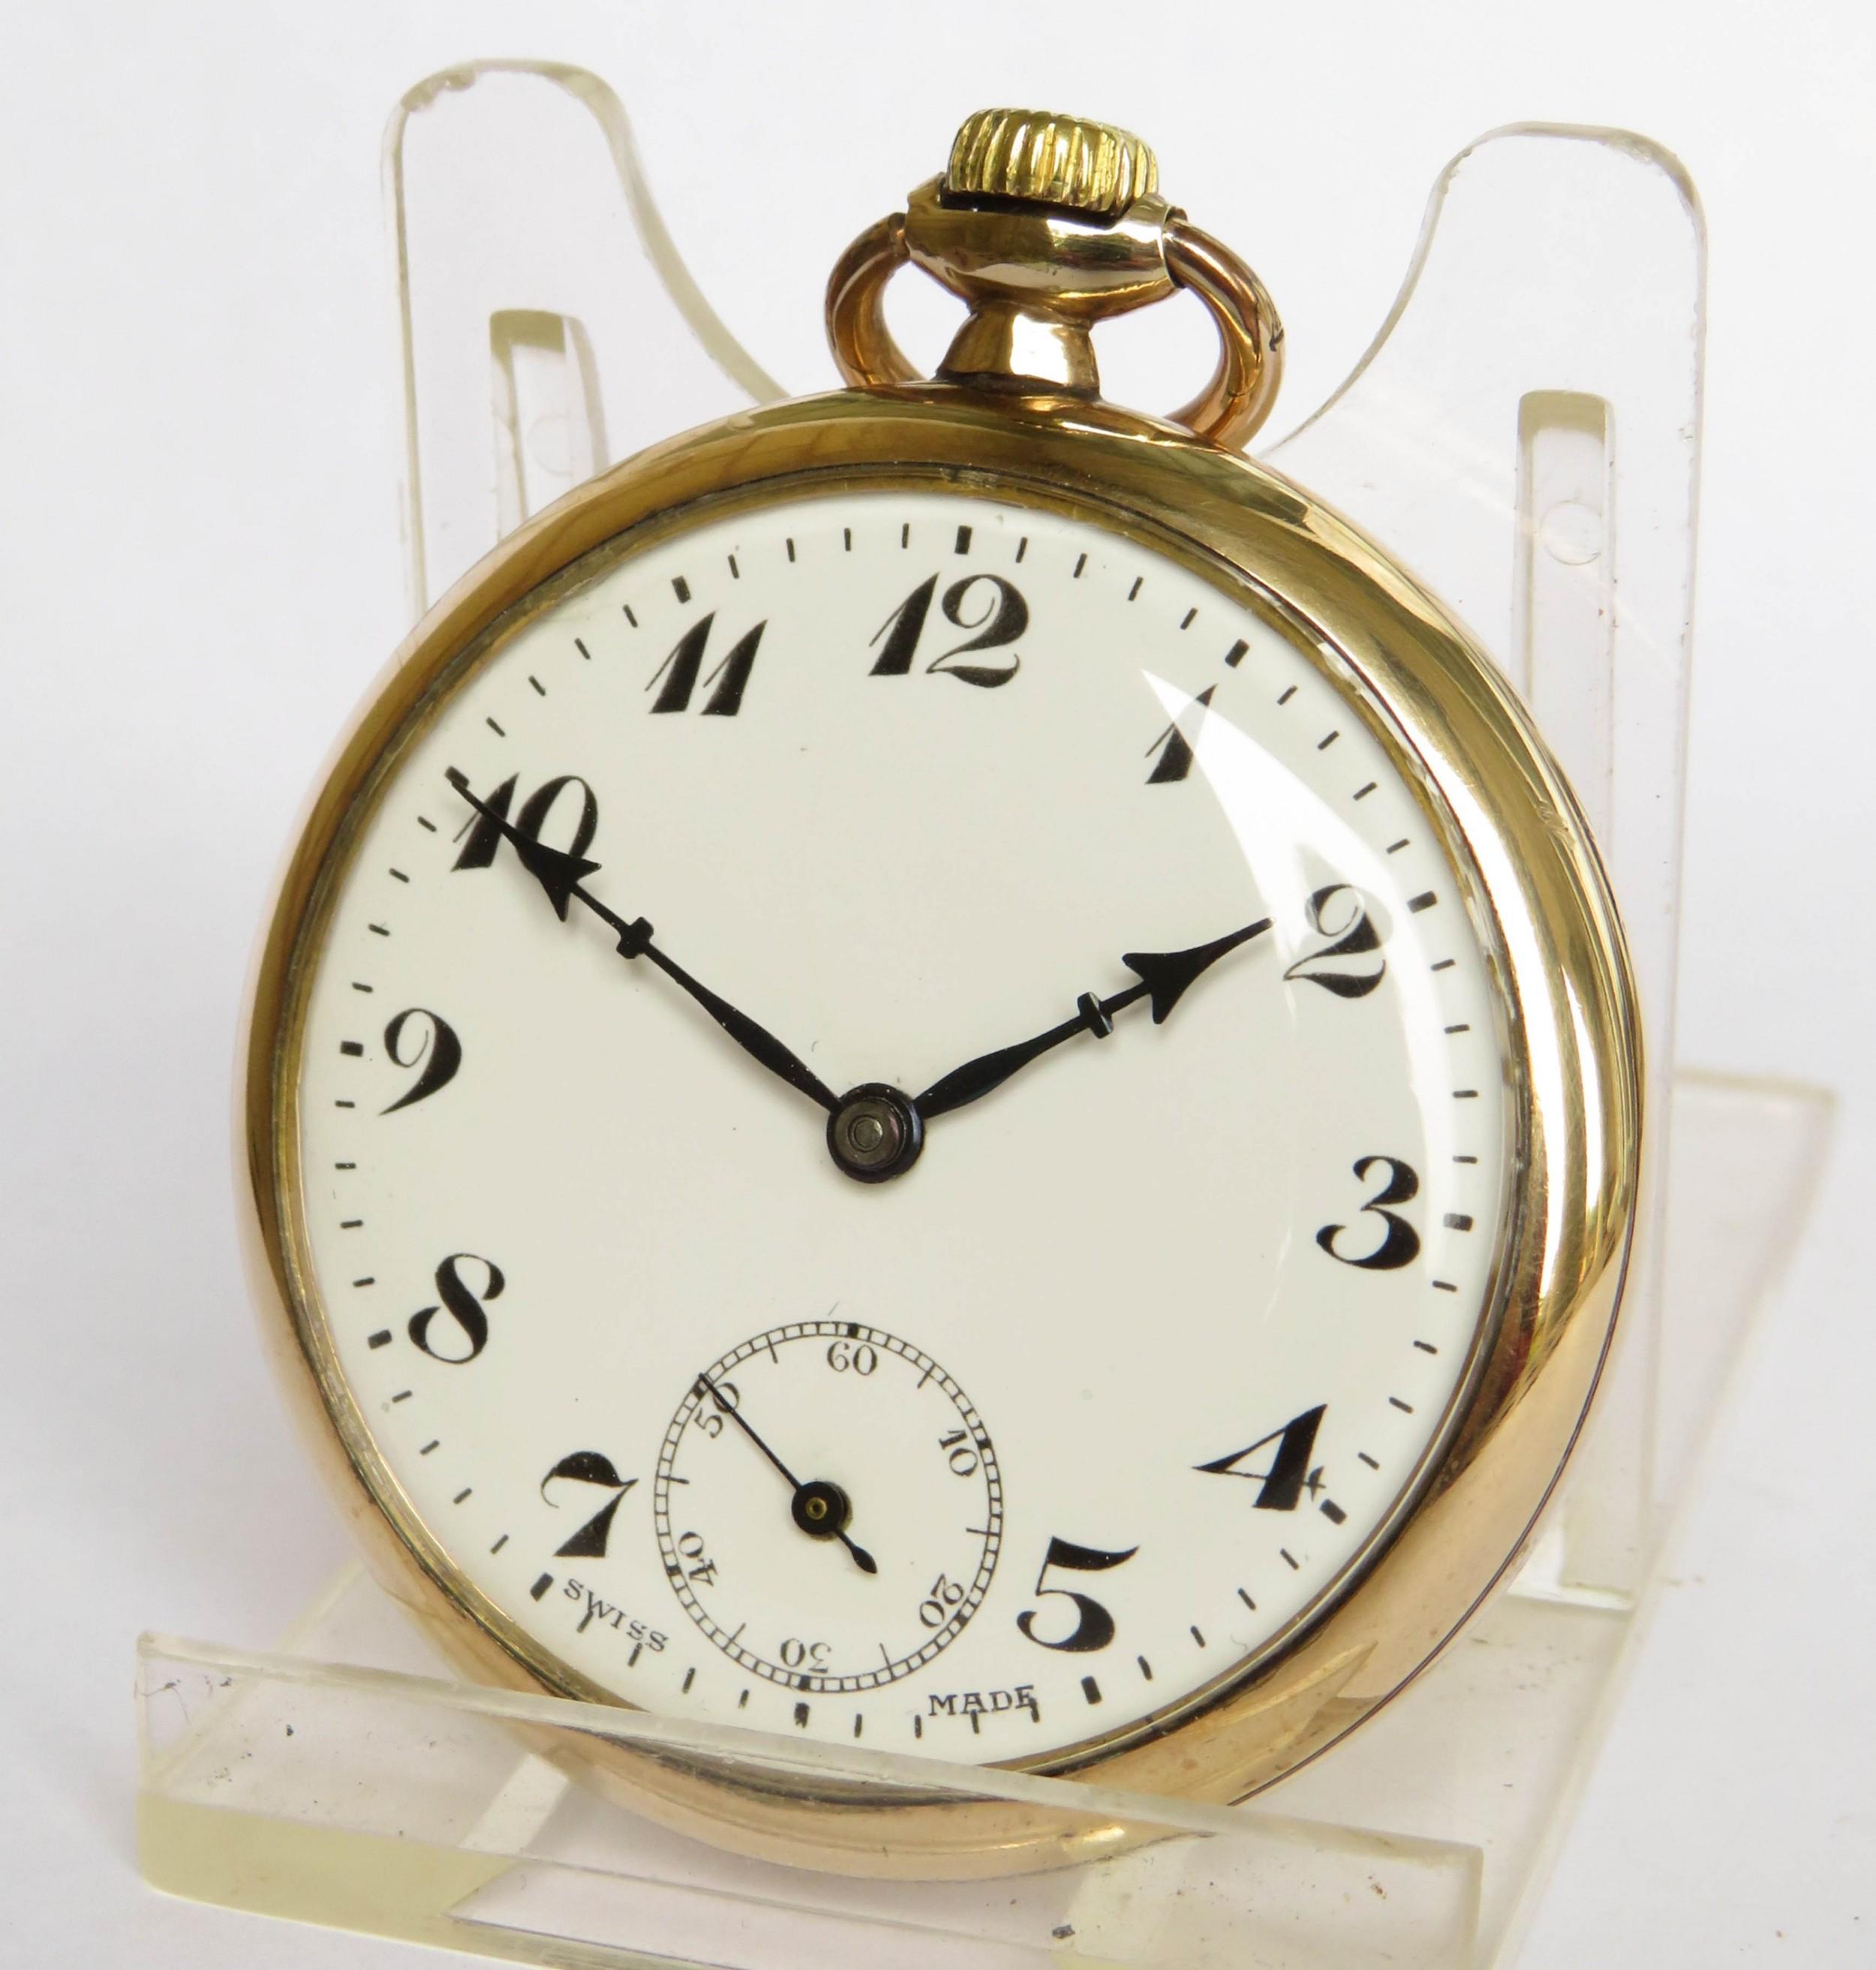 1930s unitas stem winding pocket watch